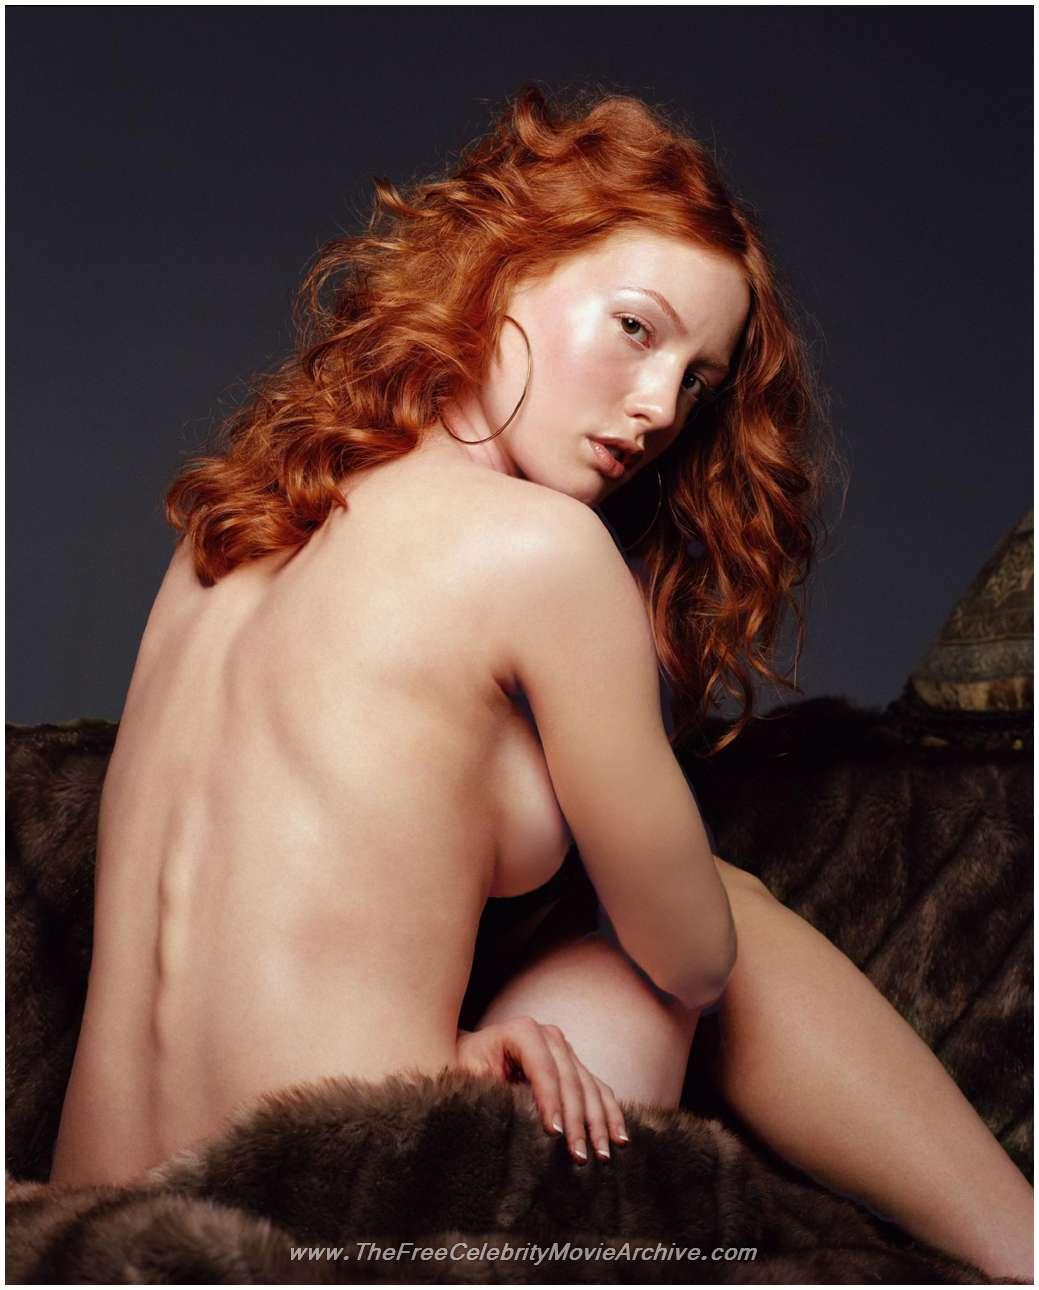 Alicia harmon nude pics opinion you